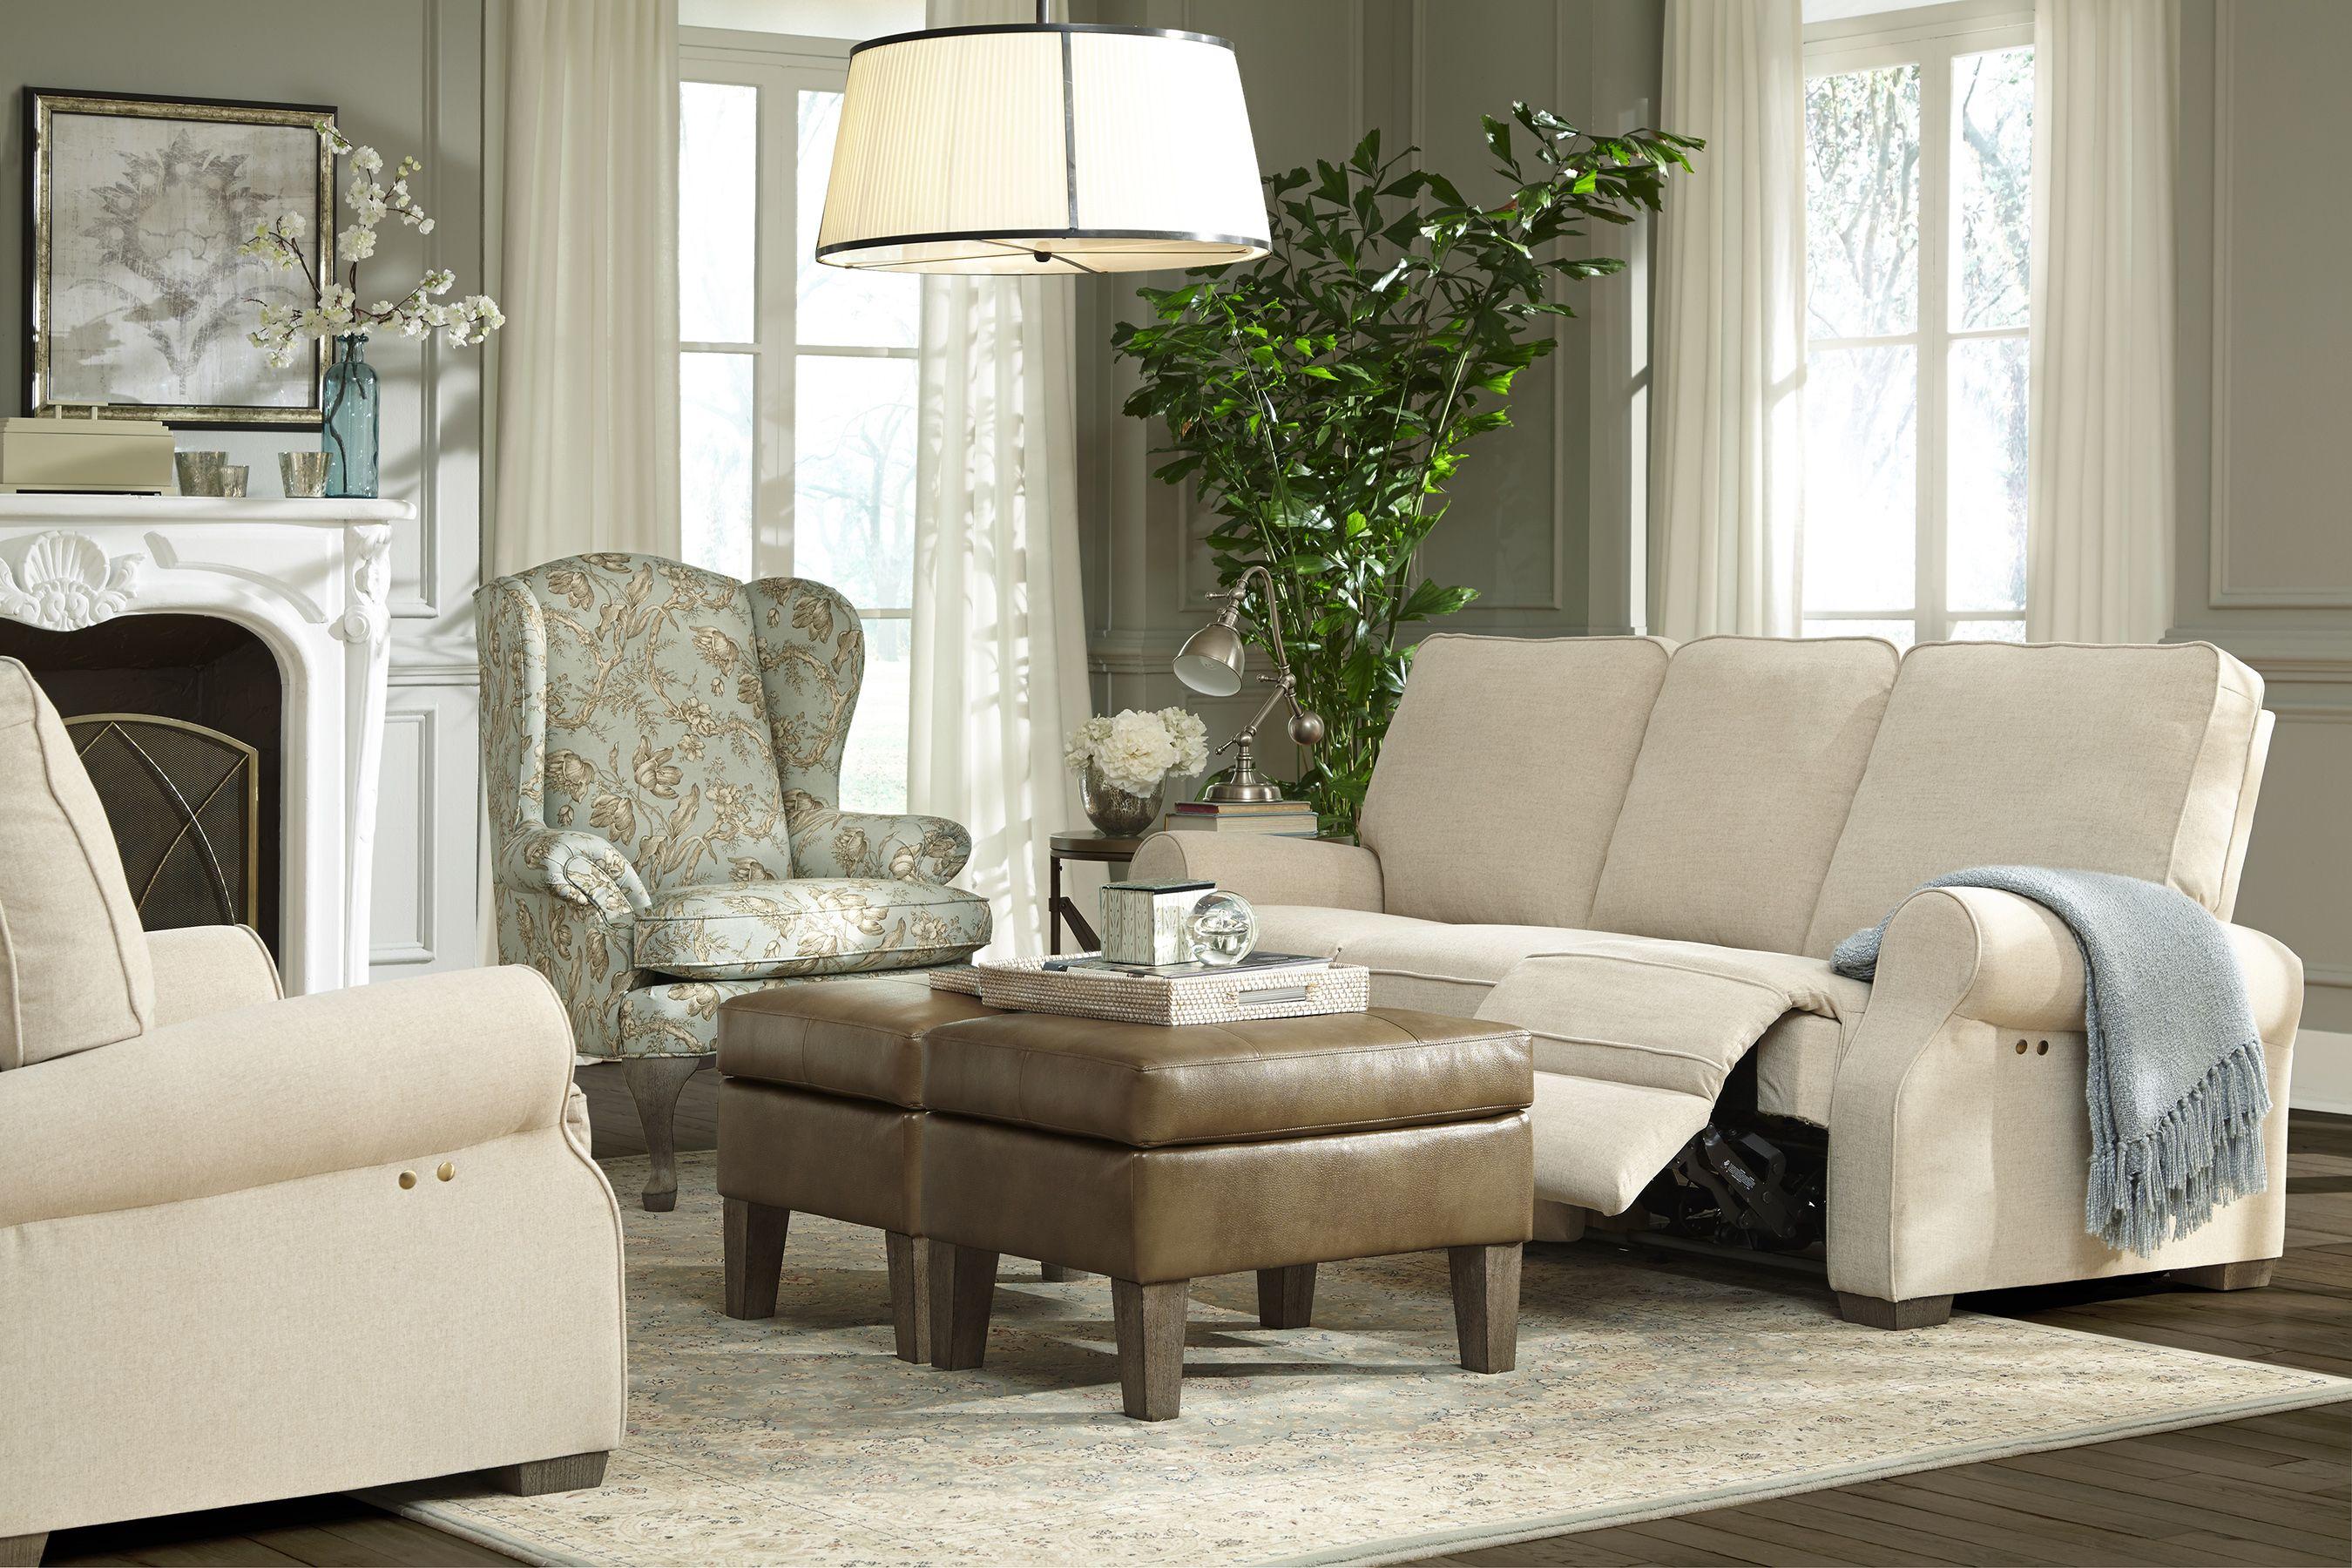 Hattie Nuvo Collection Best Home Furnishings Http Greatbridgefurnitureonline